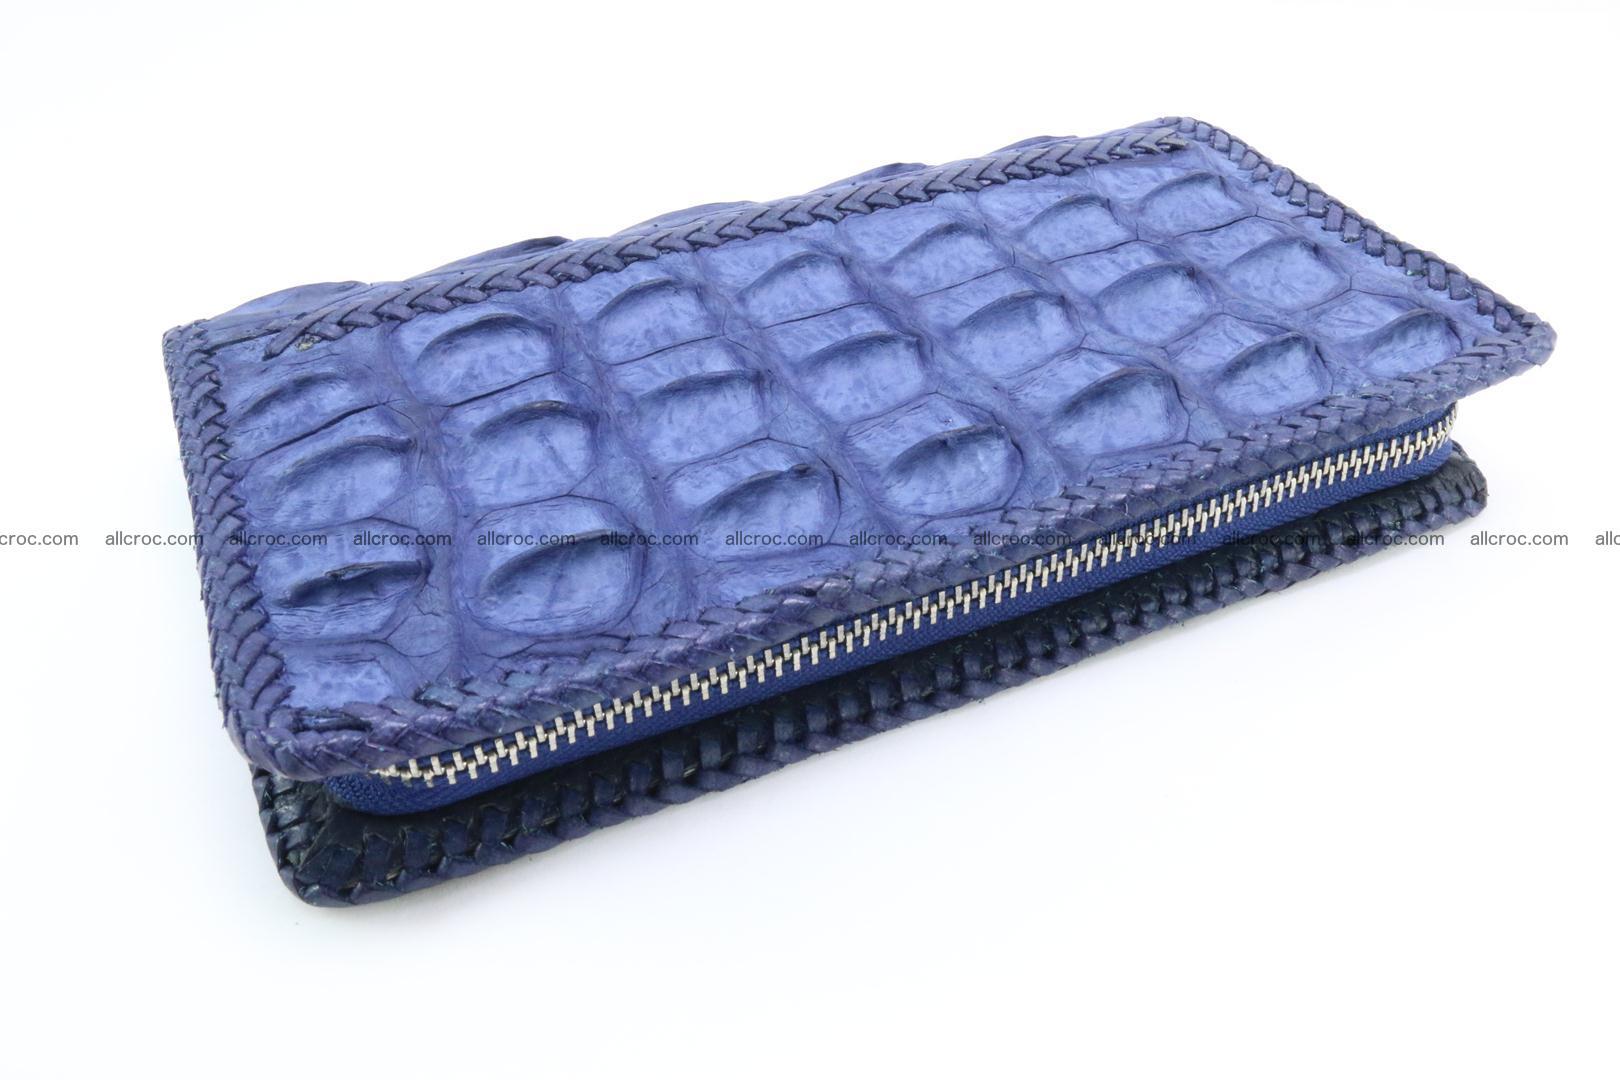 Genuine crocodile hornback wallet with zip 101 Foto 7